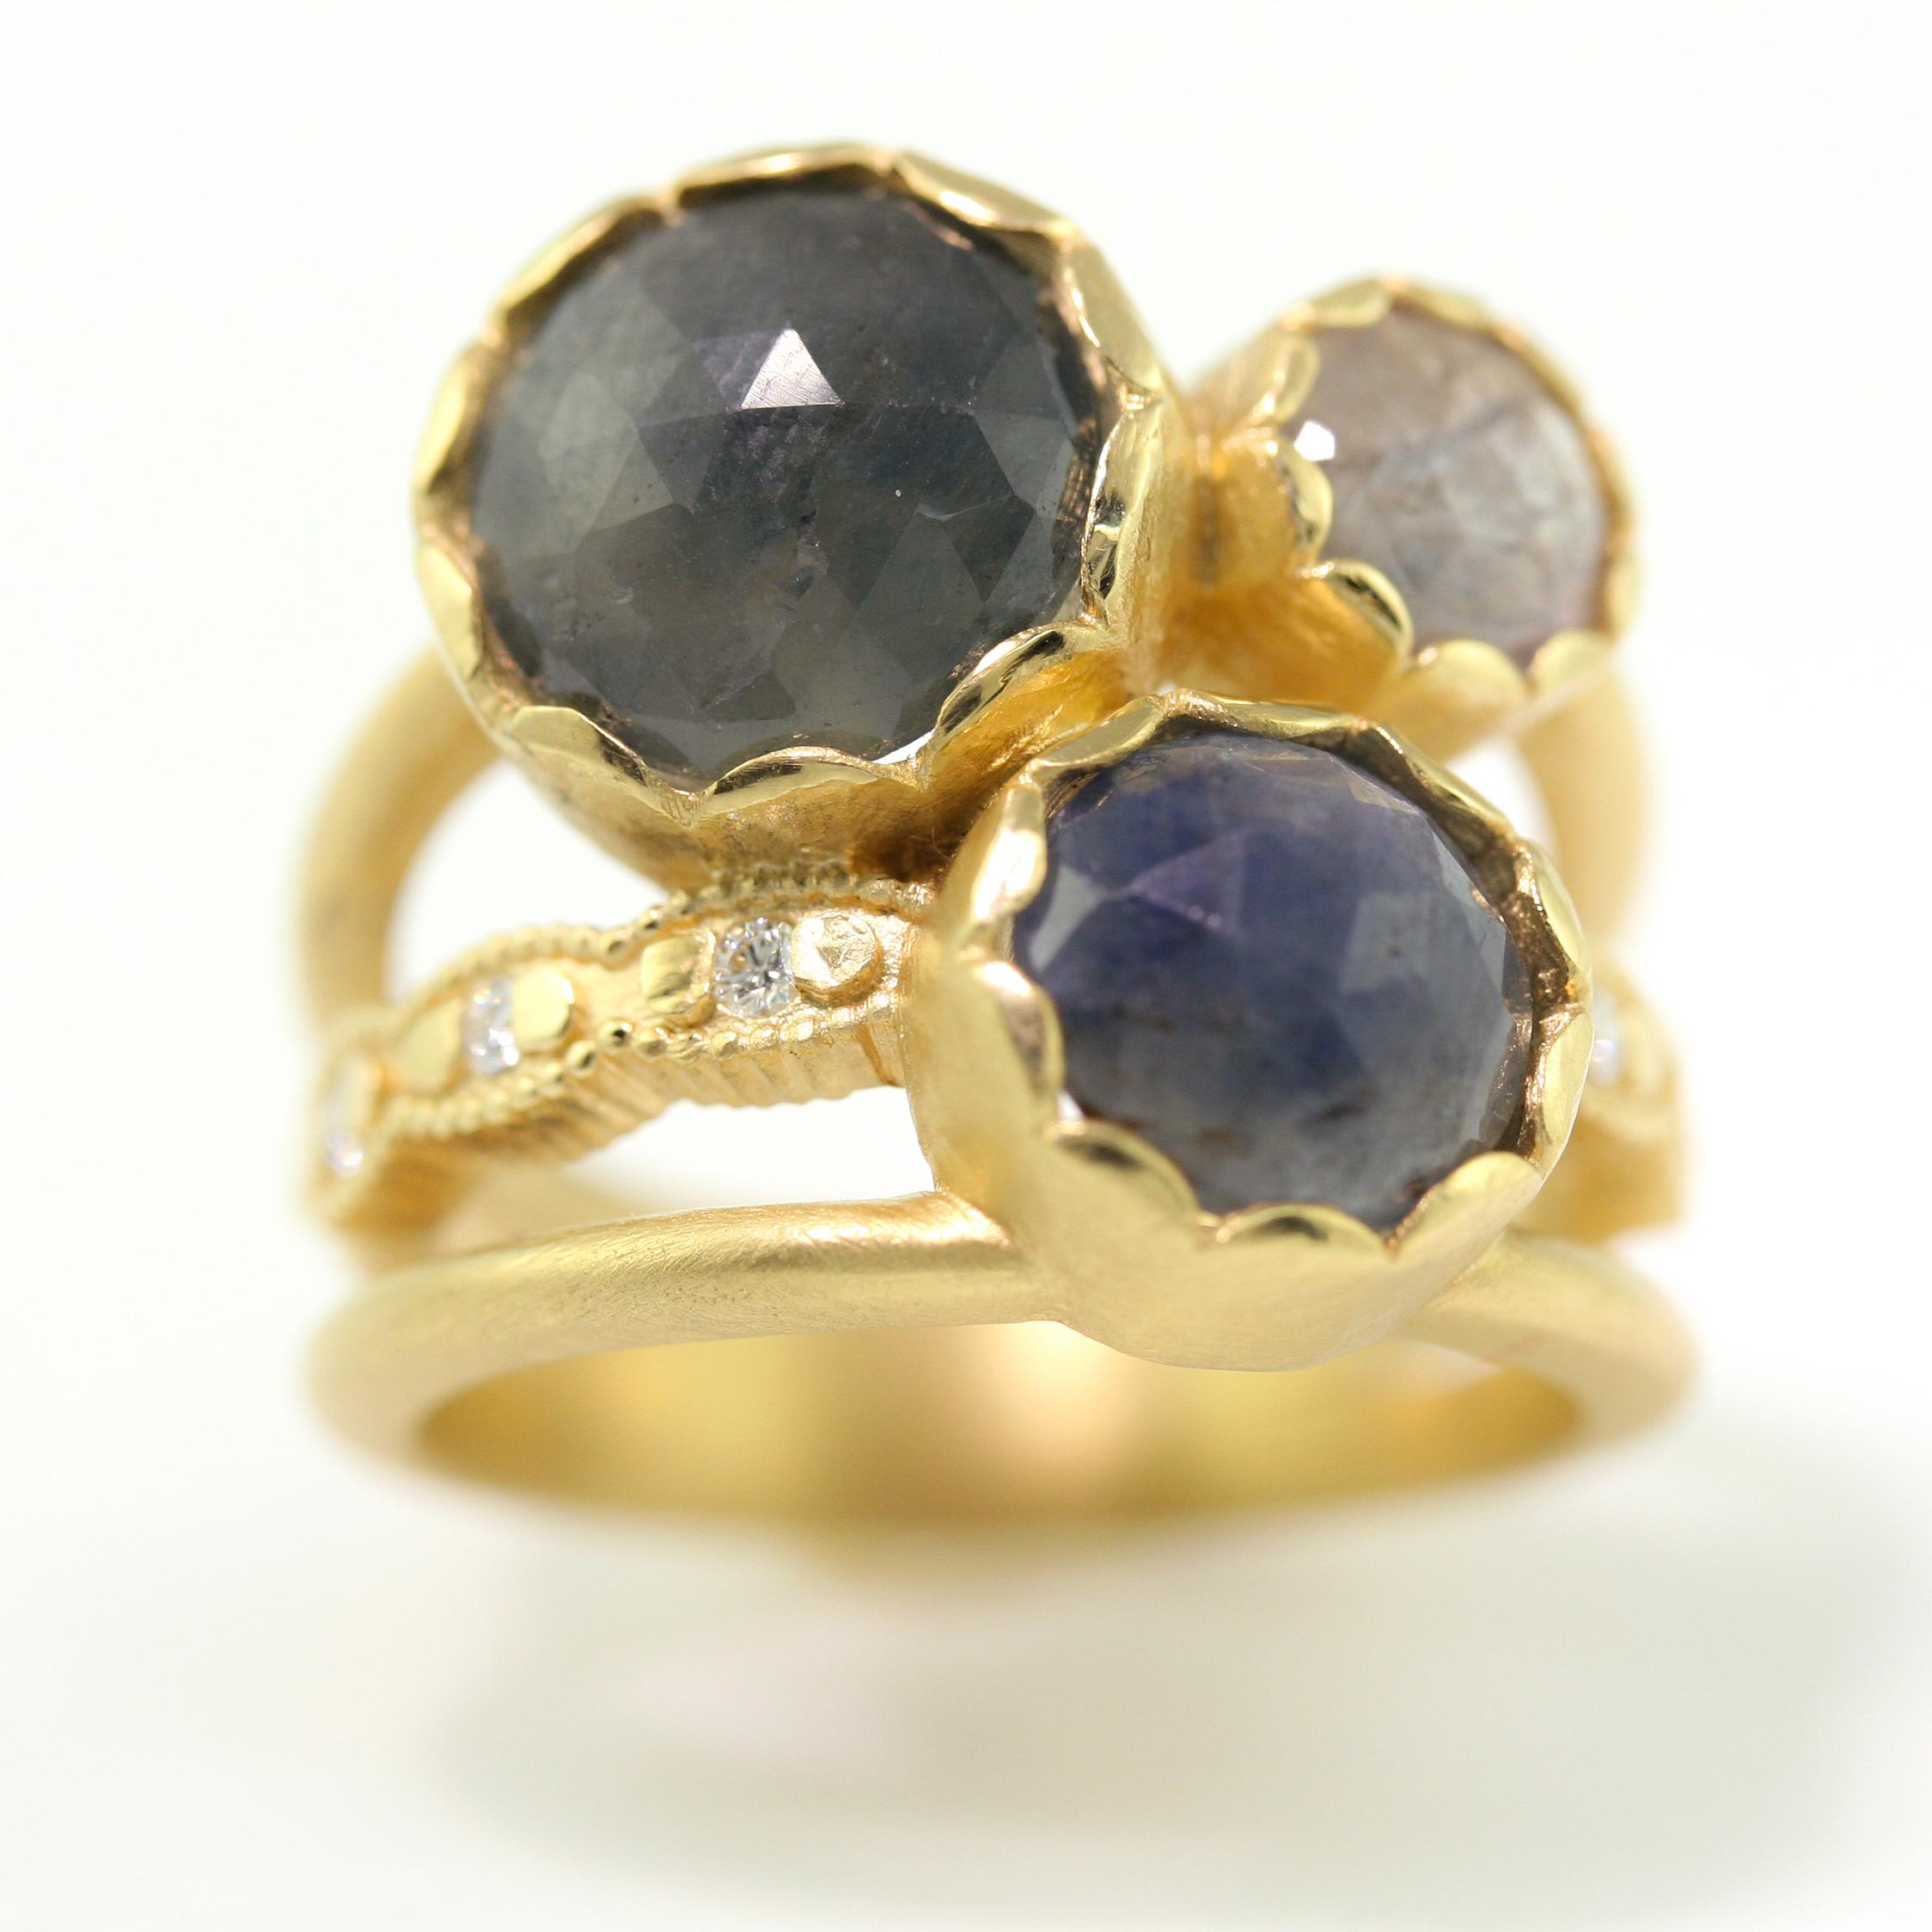 Scalloped_Bezel_3_Stone_blue_sapphire.jpg